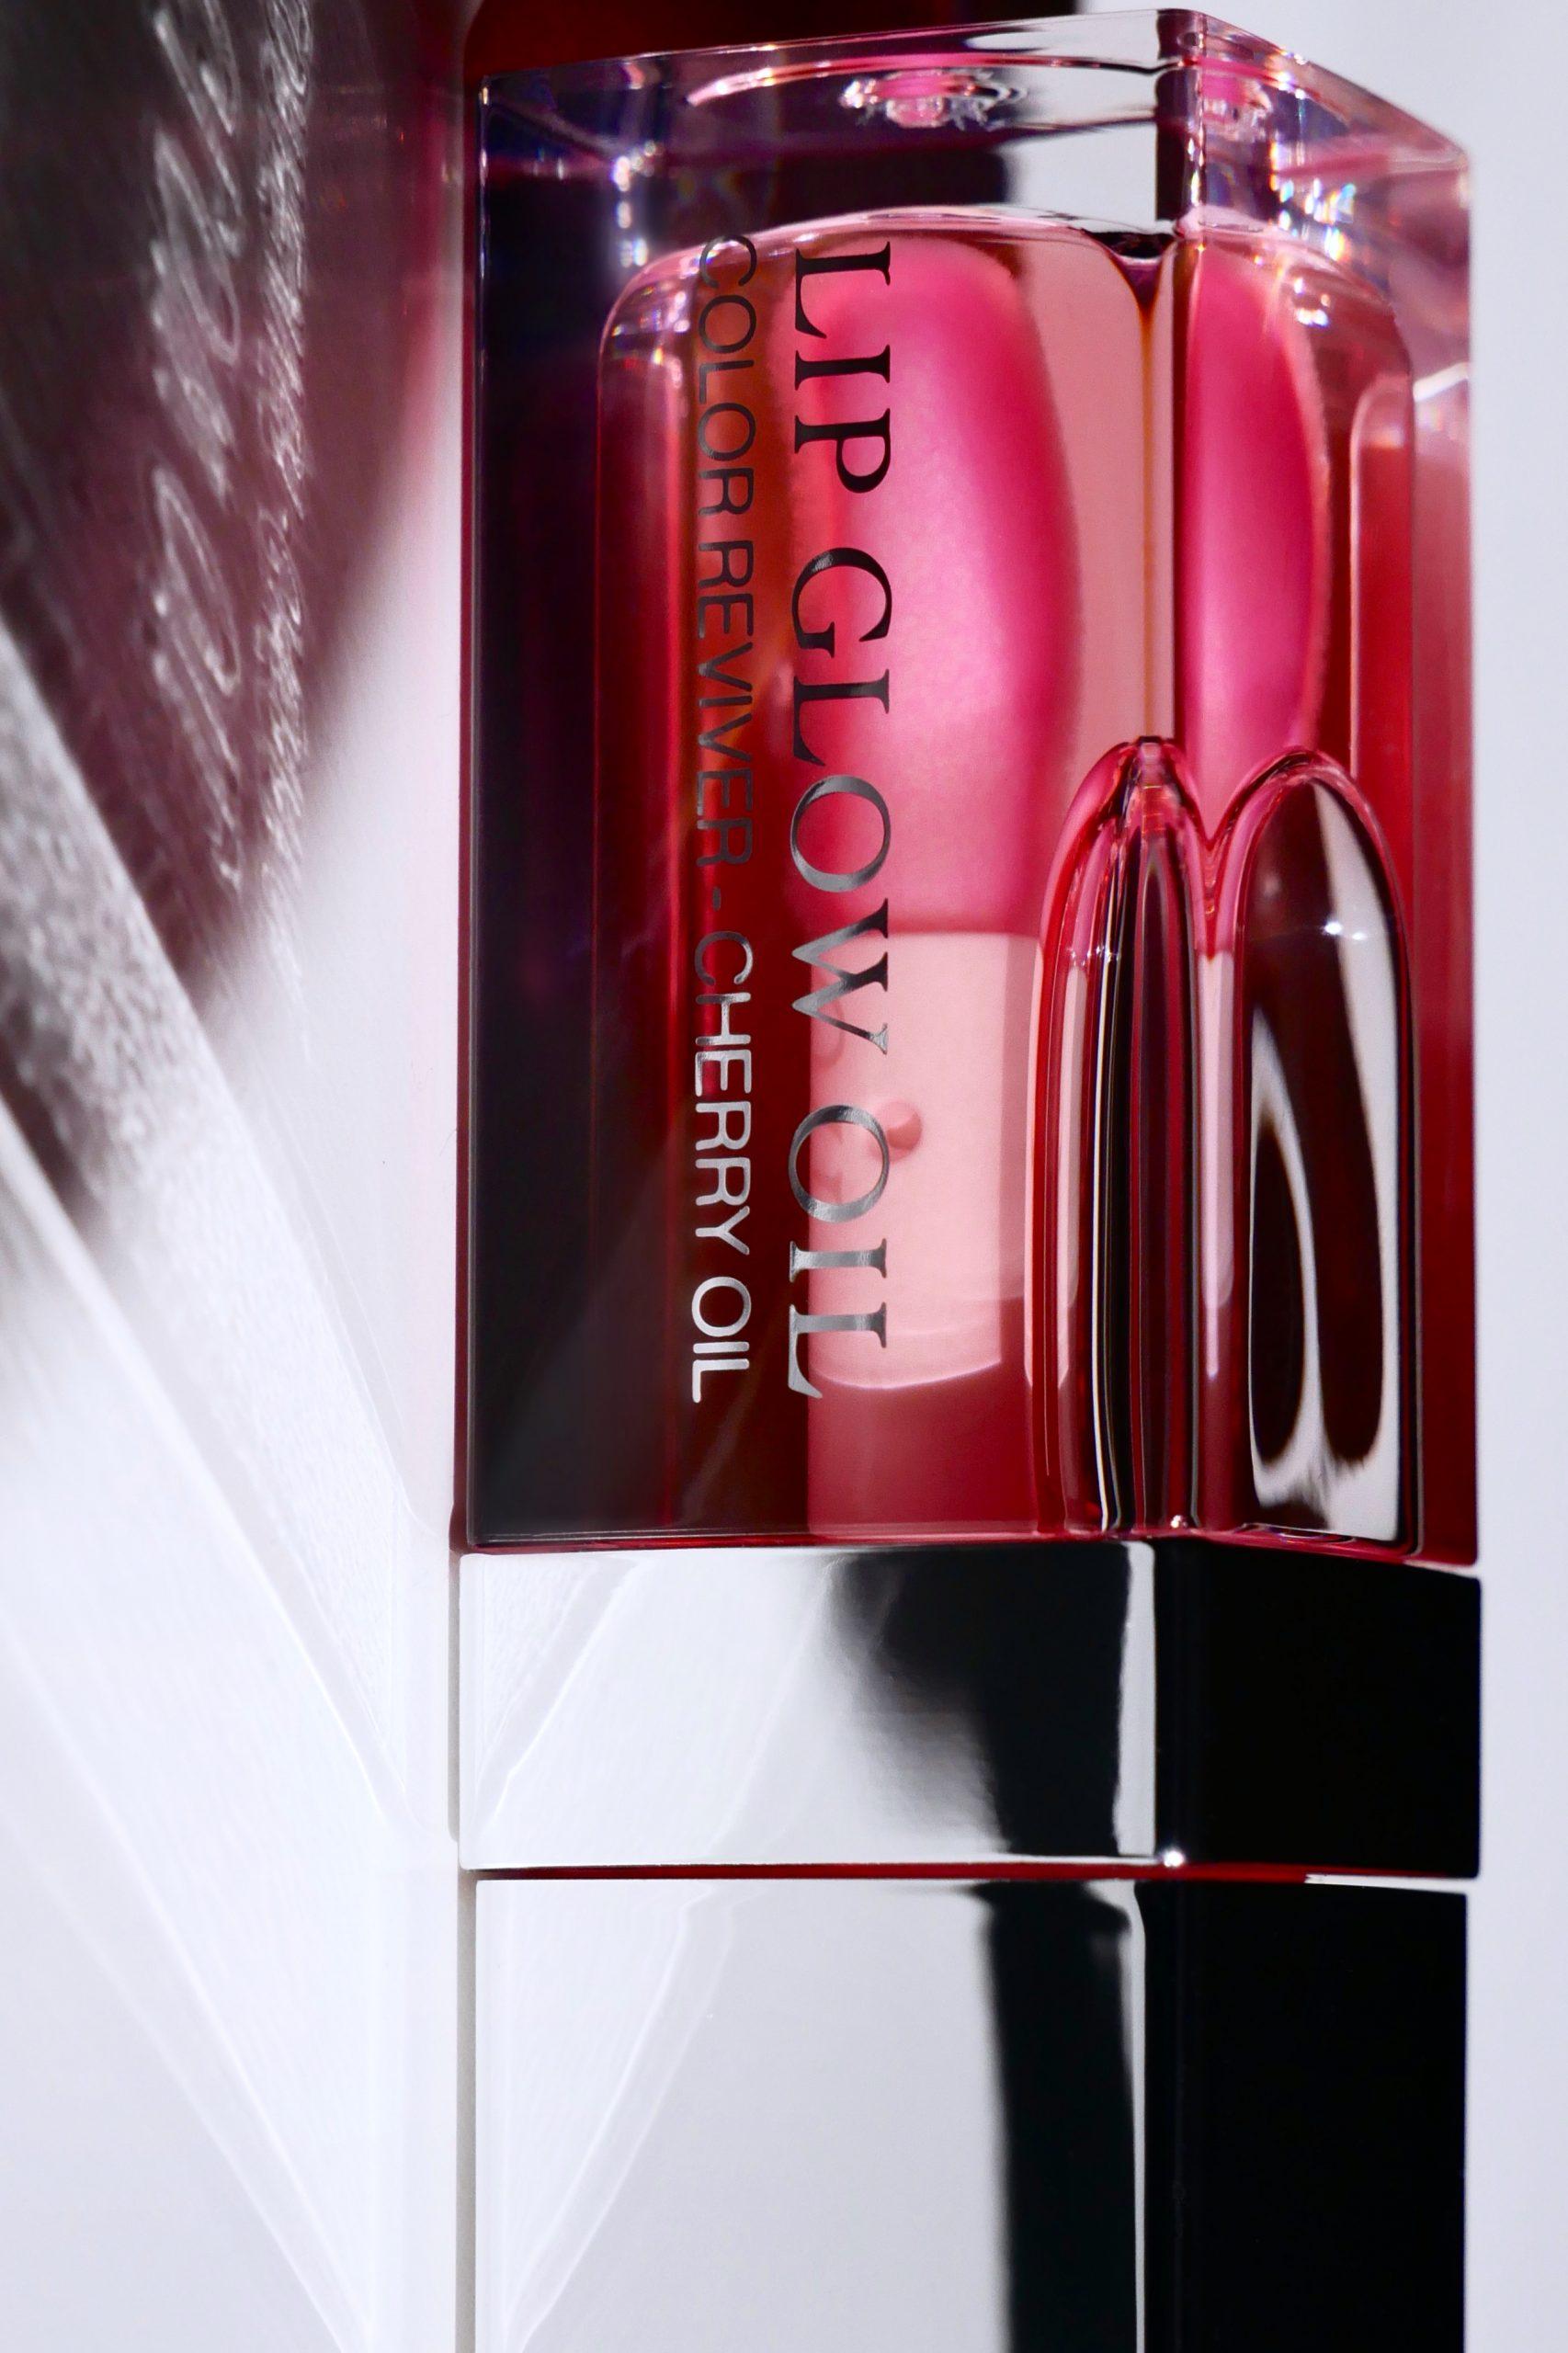 Dior Addict Lip Glow Oil, 001 Pink, Tori Vale, Tori Vale photography, Dior Makeup